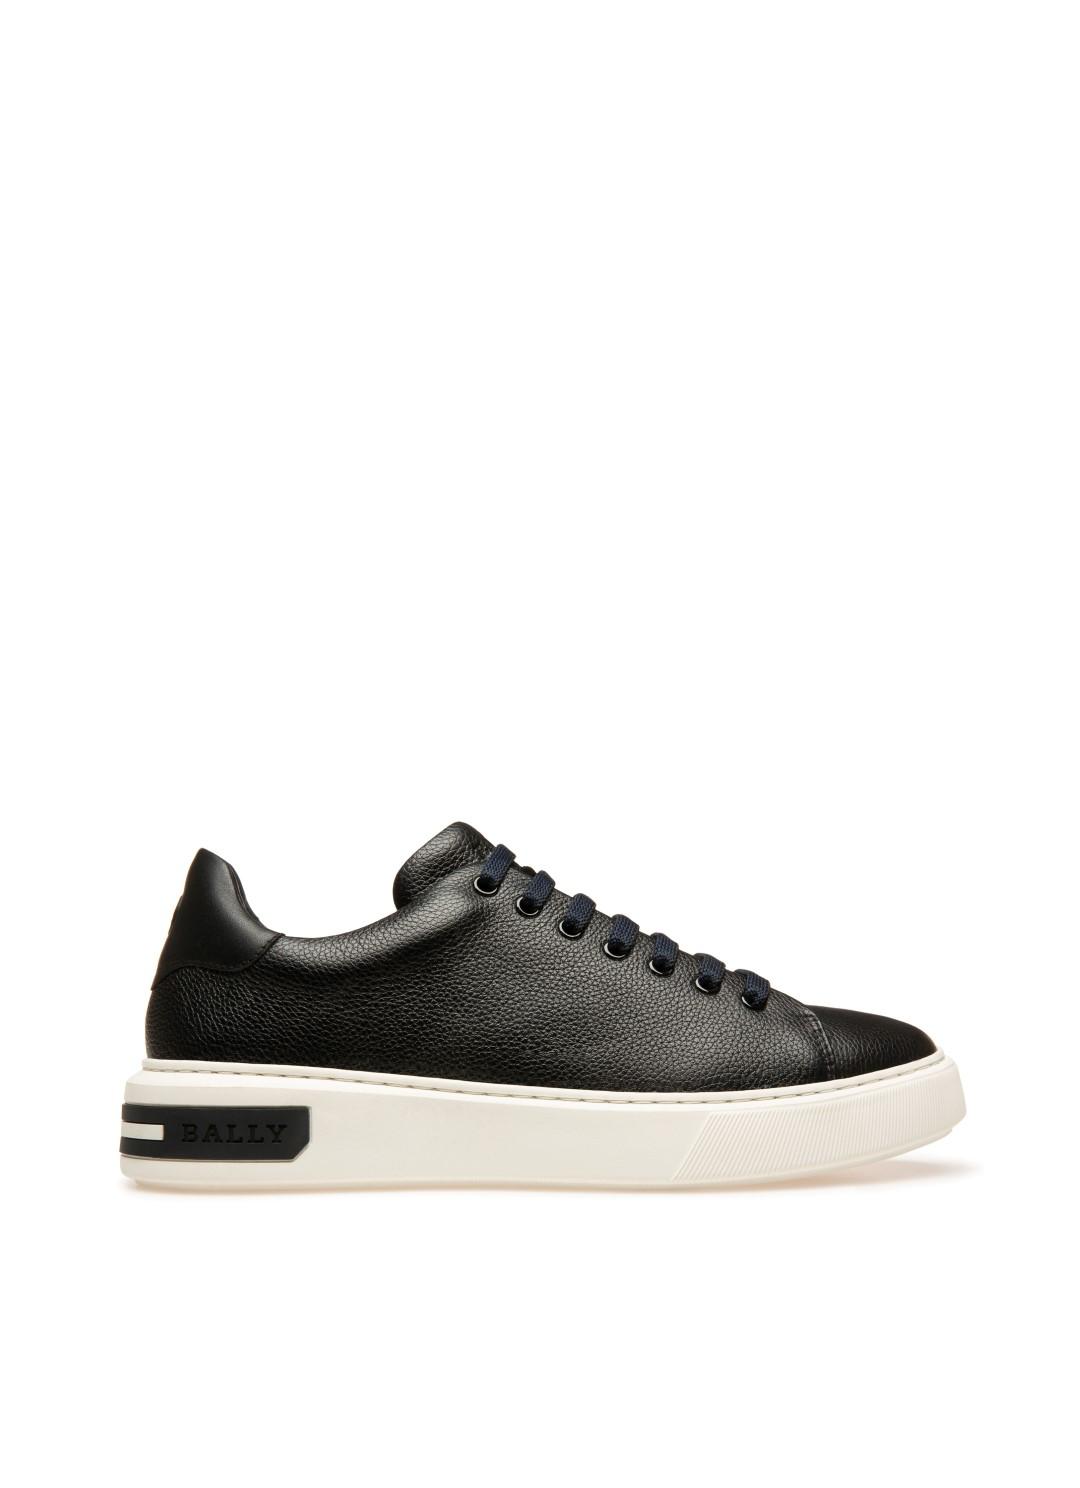 Sneaker Bally Lift